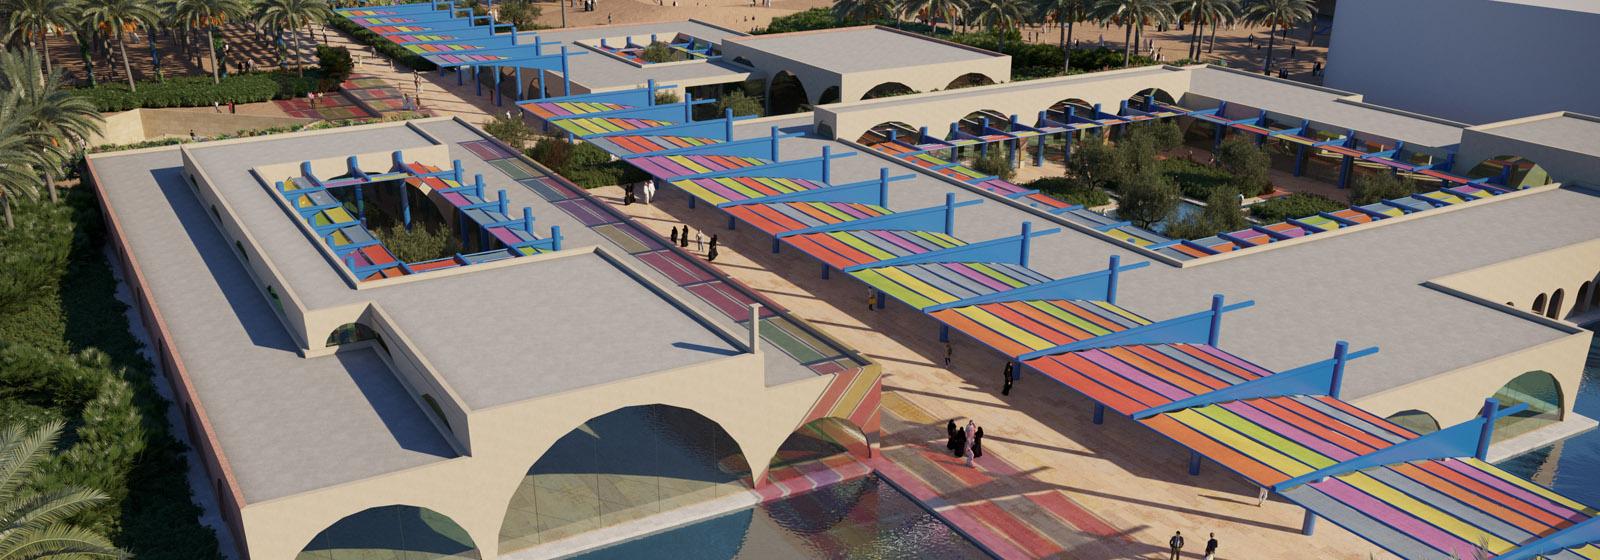 Almedina Youth House Complex and Plaza